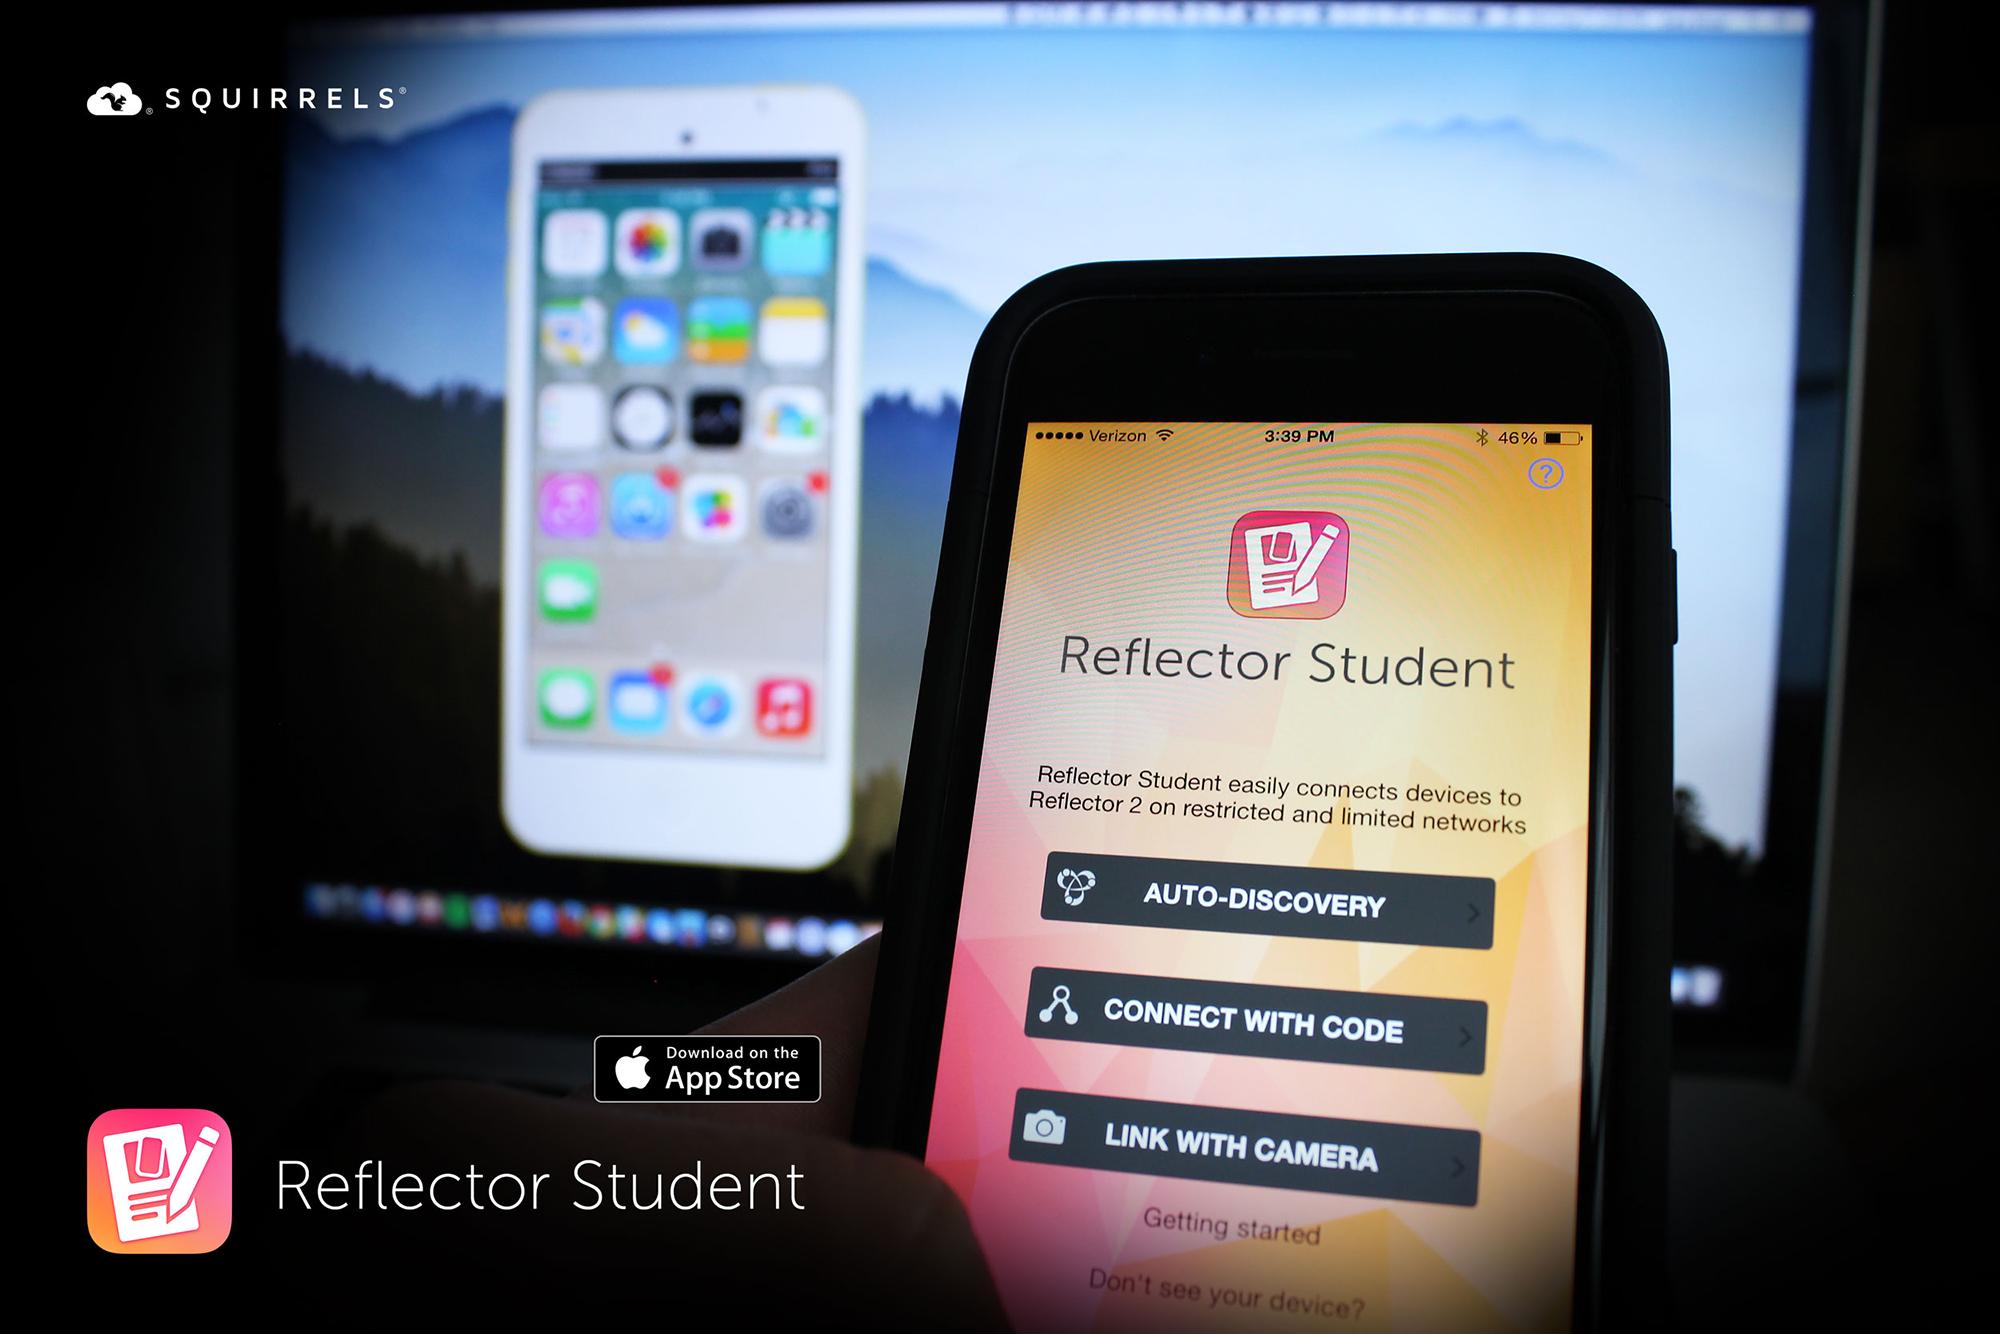 Reflector Student Press Shot